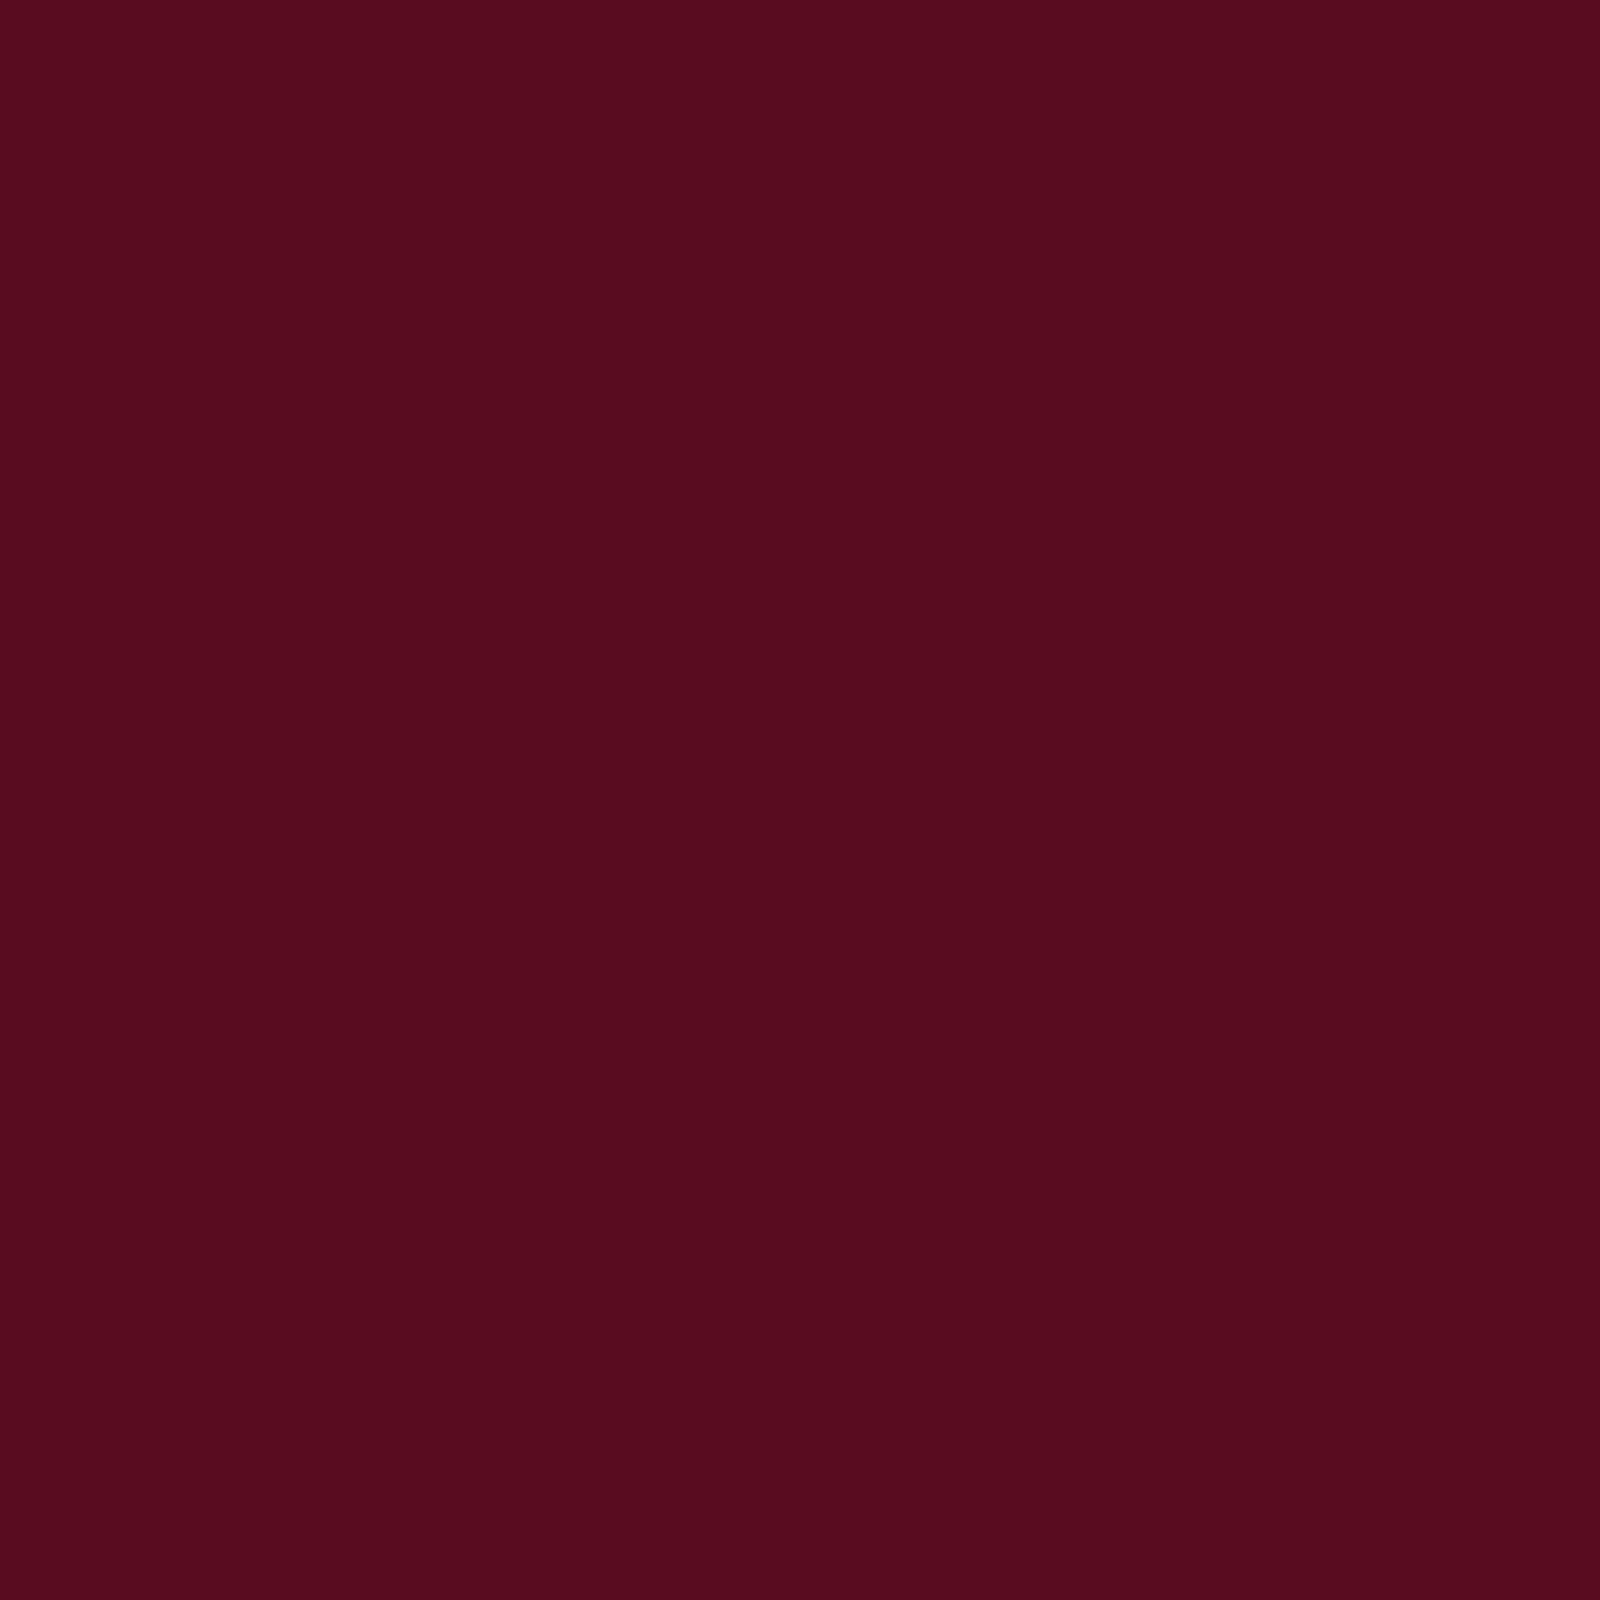 Cotton Mako - Wine - 12wt - 54yds